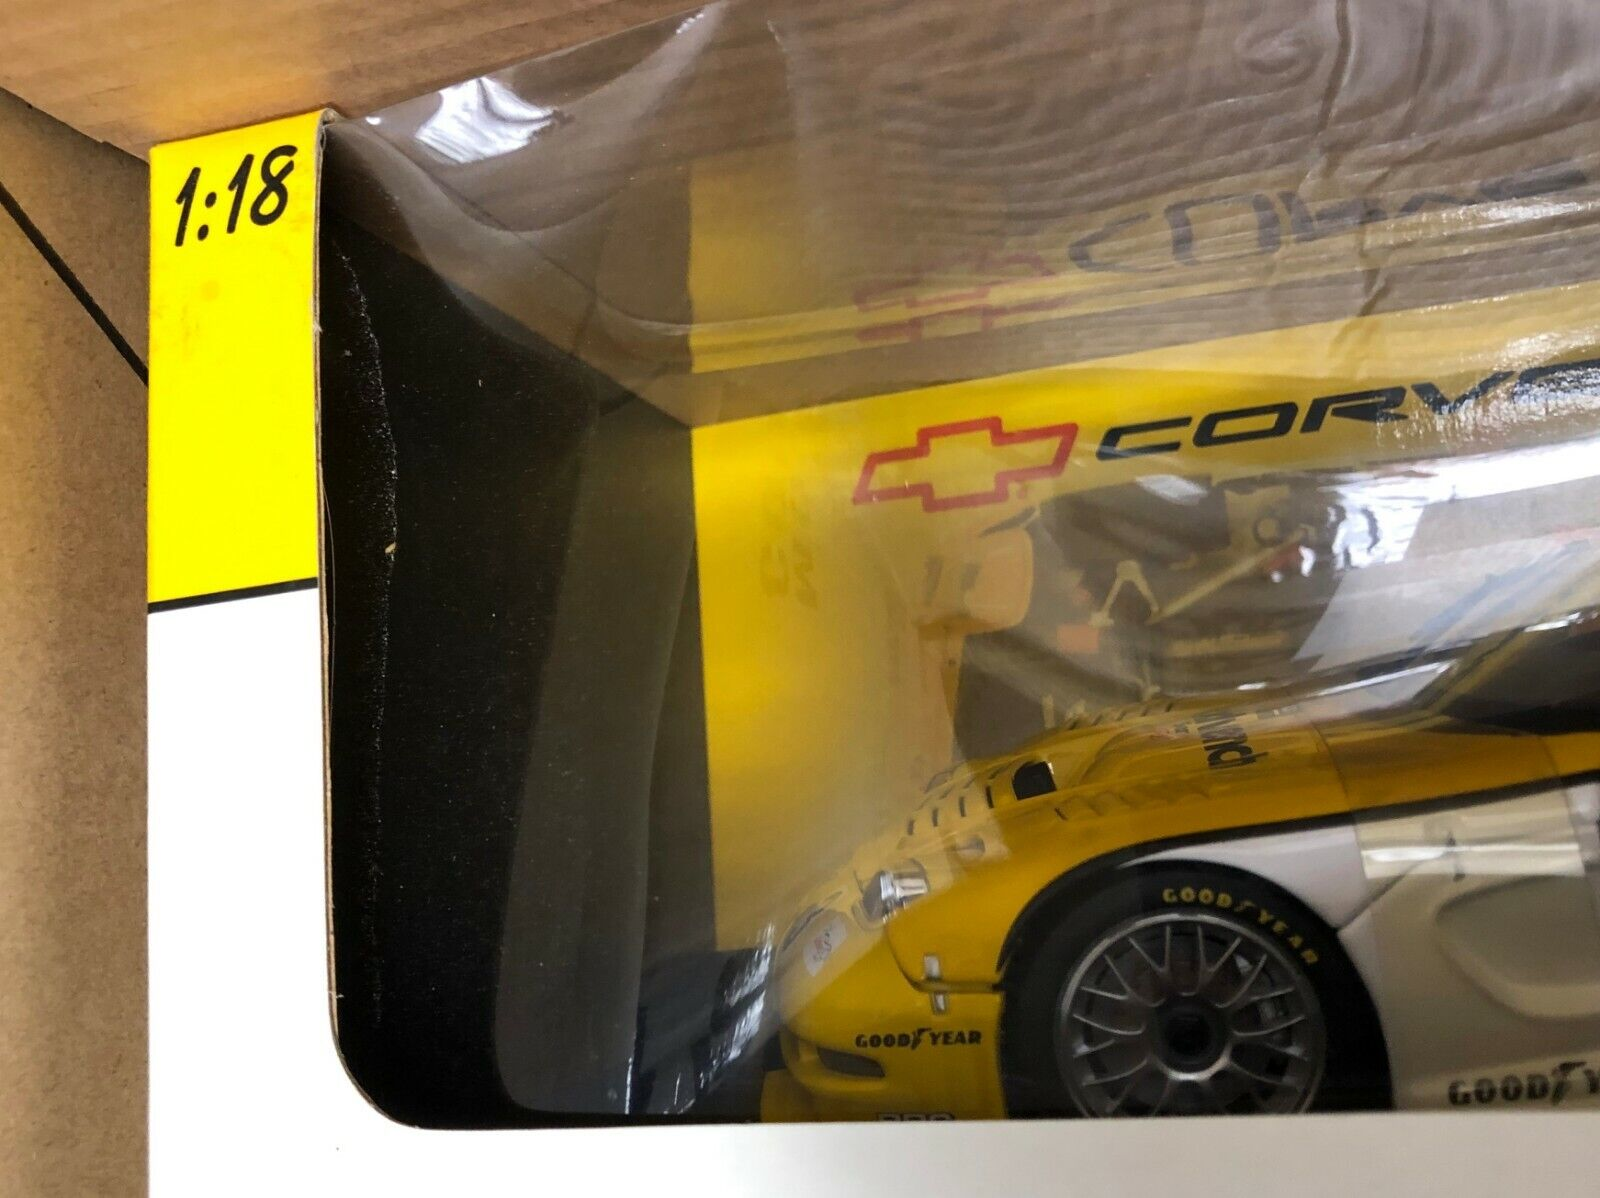 2000 CHEVROLET CORVETTE RACING RACING RACING C5R ALMS RON FELLOWS 1 18 by AUTOart 80005 4d1e4d